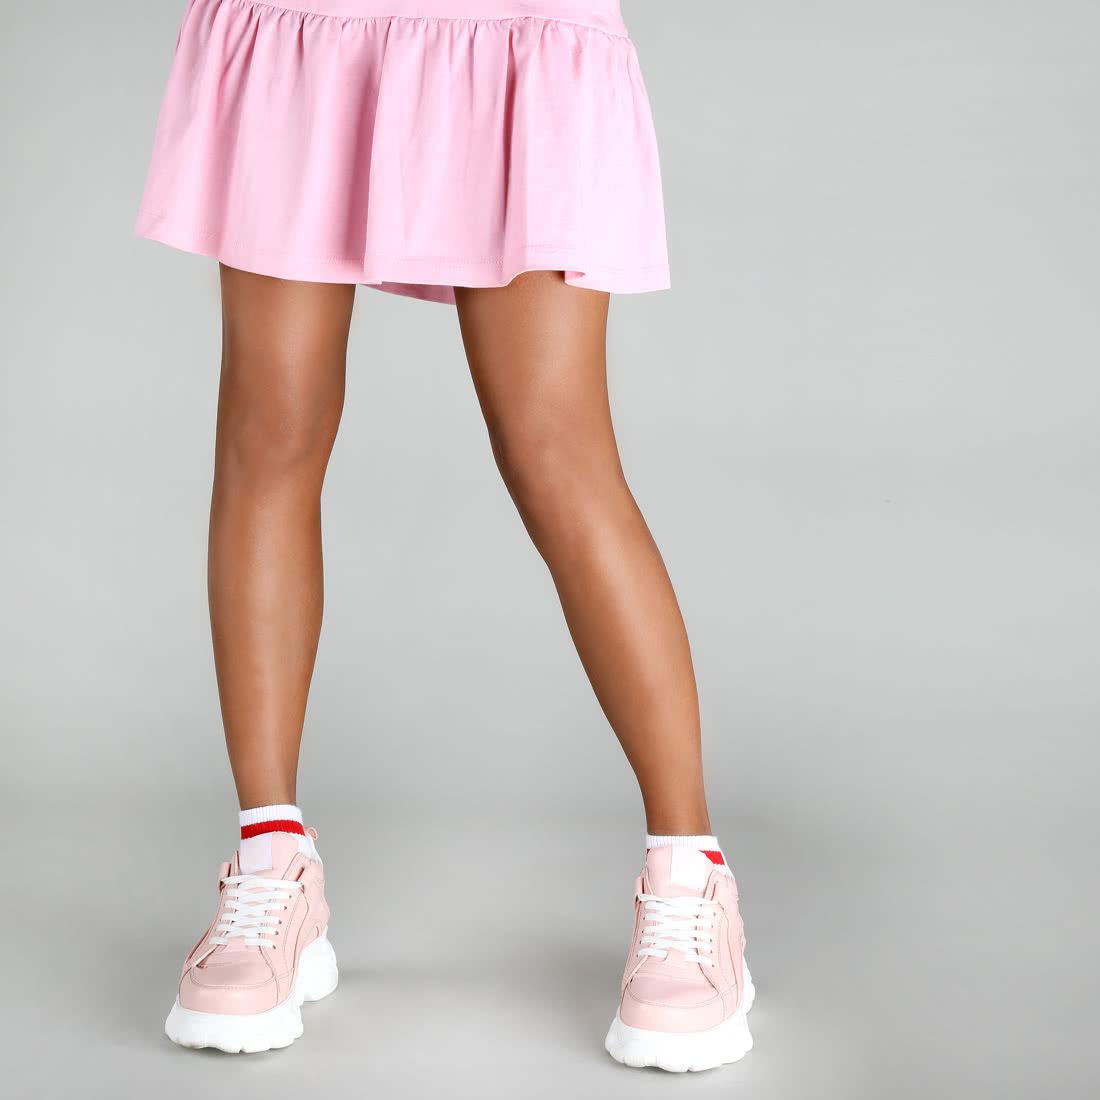 Outfit with pink sneakers | Pink sneakers, Pink sneakers